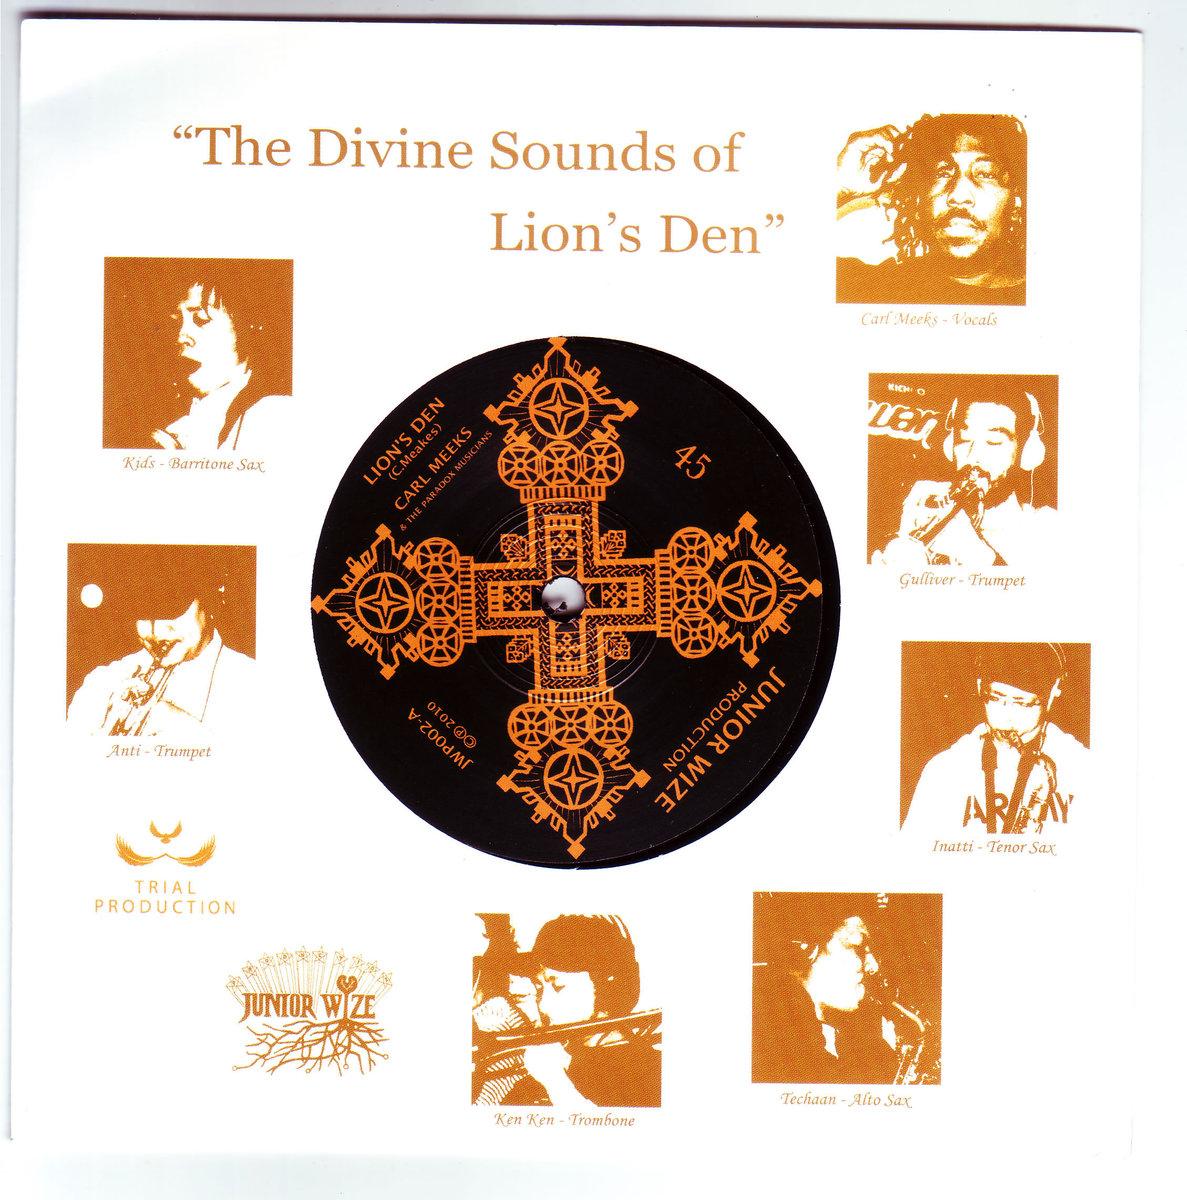 Carl Meeks - Lion's Den (JWP002) をリリース